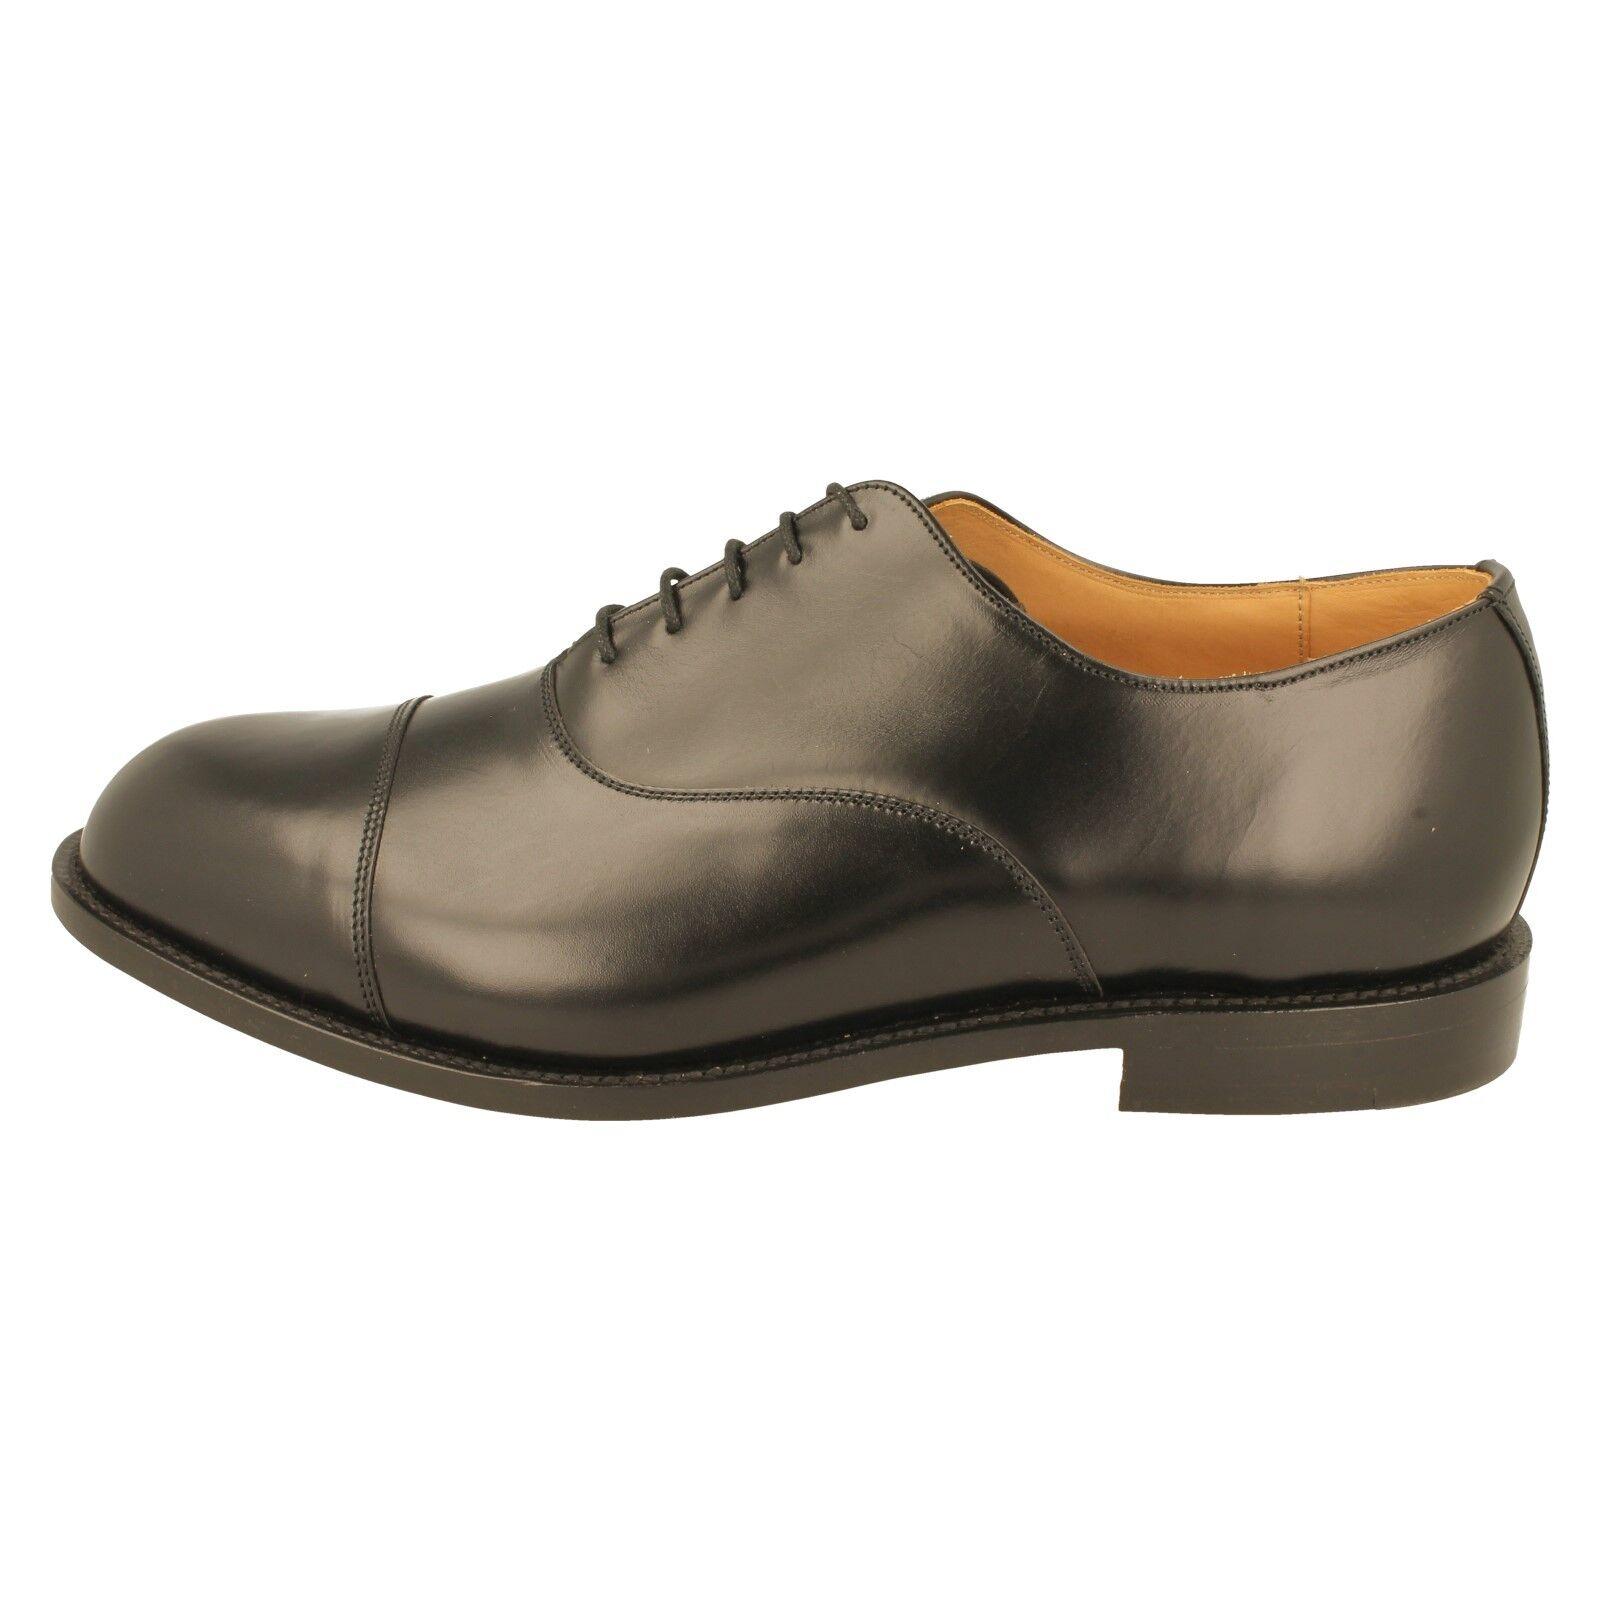 Mens DB Oxford Goodyear Fitt Welted Shoes  EE-4E Wide Fitt Goodyear - Ivor 76984b